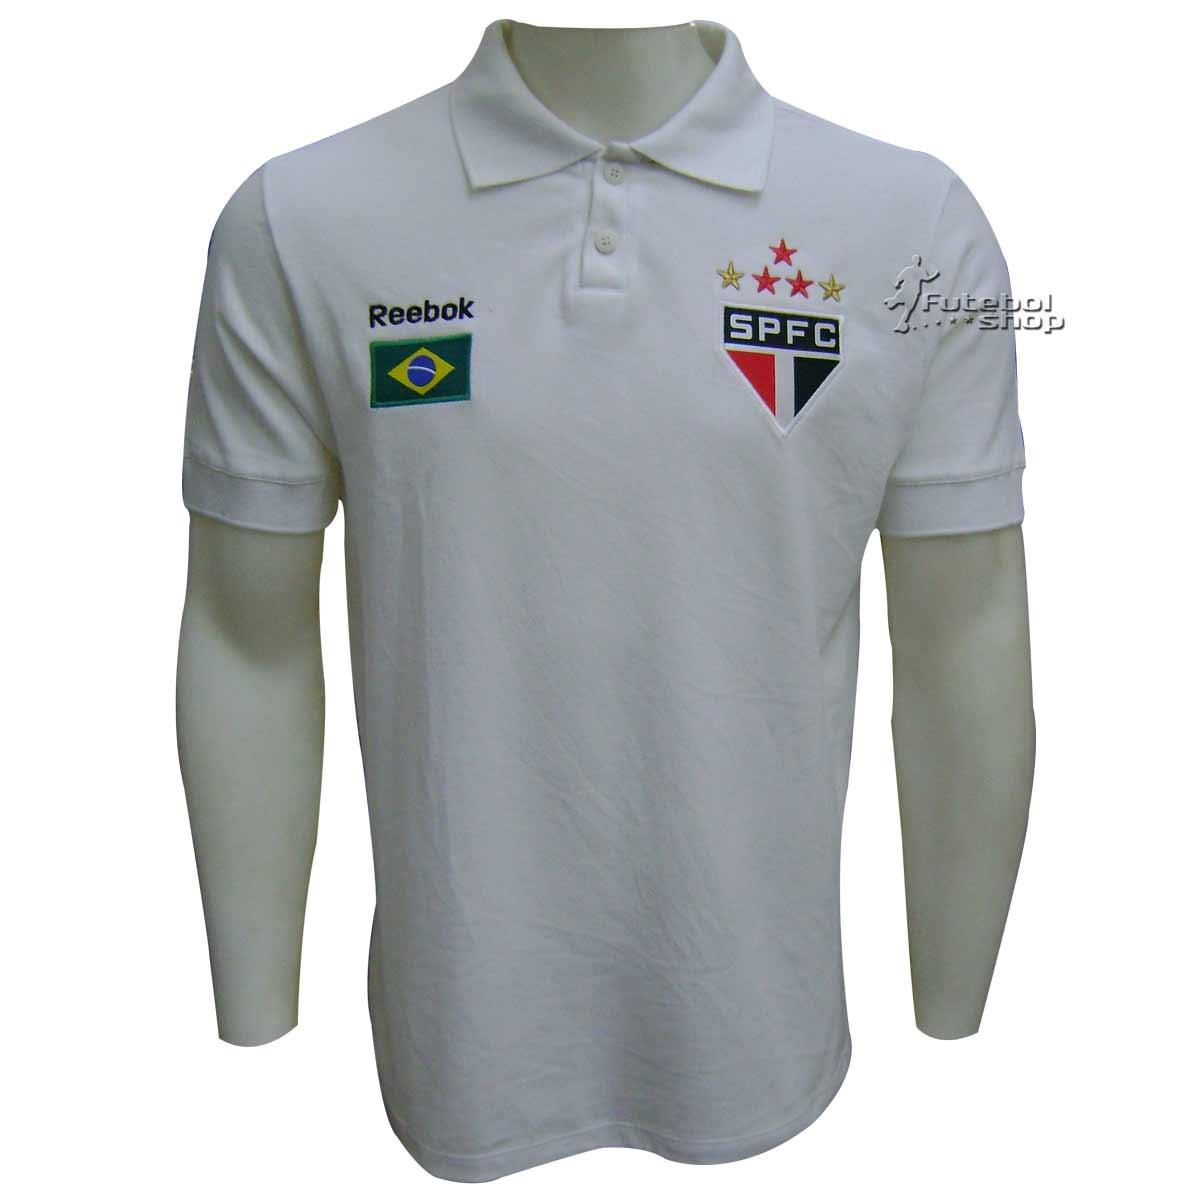 01215f770c Camisa Polo Brasil São Paulo F.C. - SP09060V - FUTEBOL SHOP ...